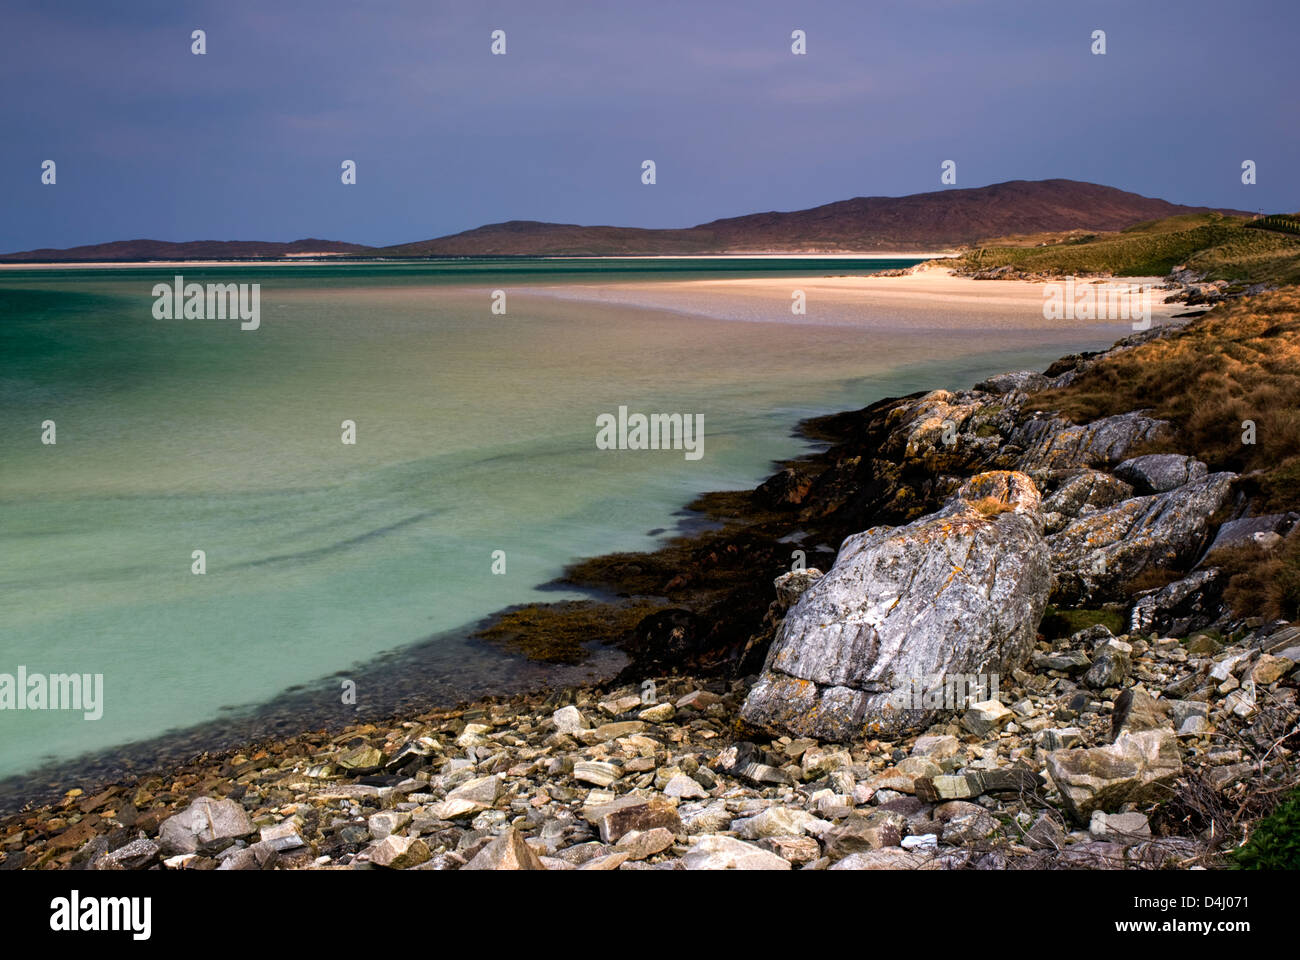 Luskentyre Beach, Isle of Harris, Outer Hebrides, Scotland. - Stock Image